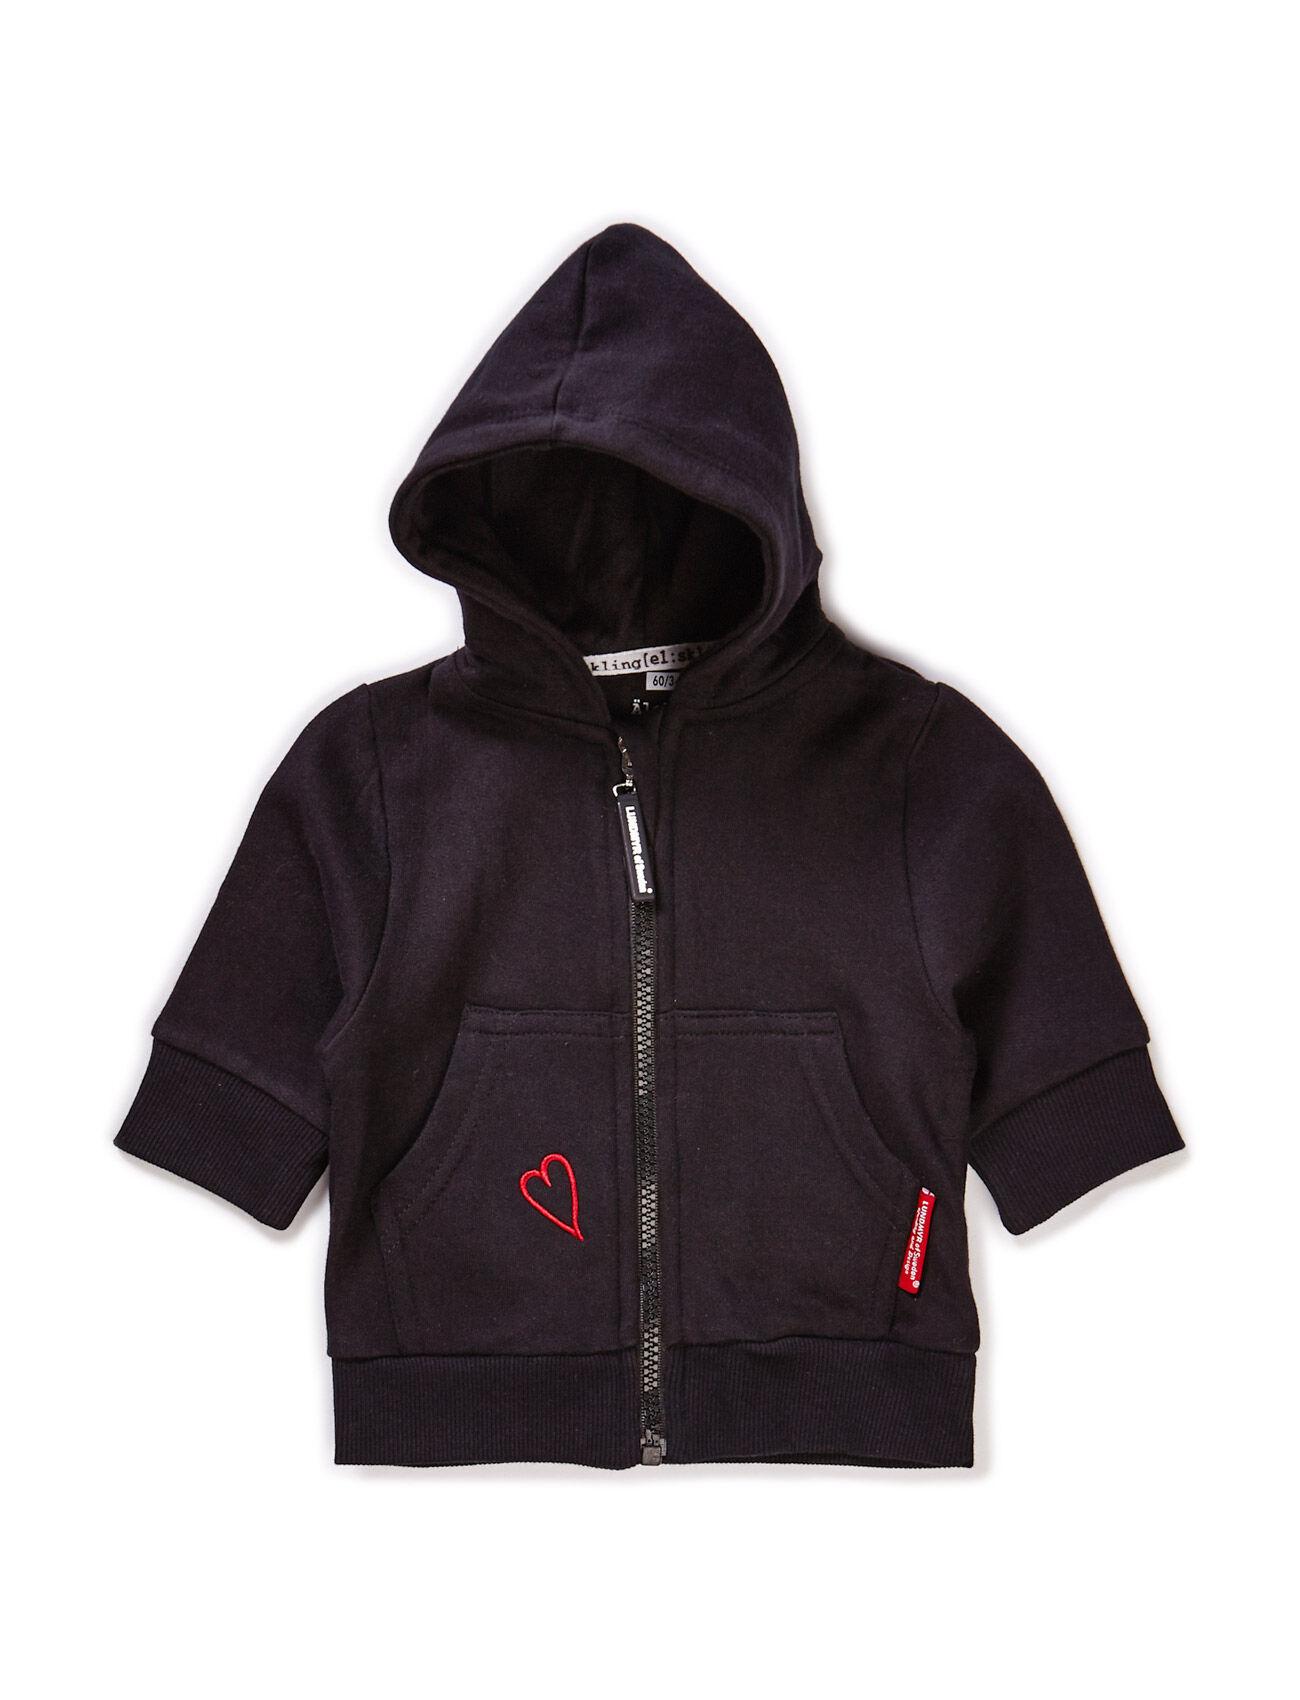 Lundmyr Hooded Jacket